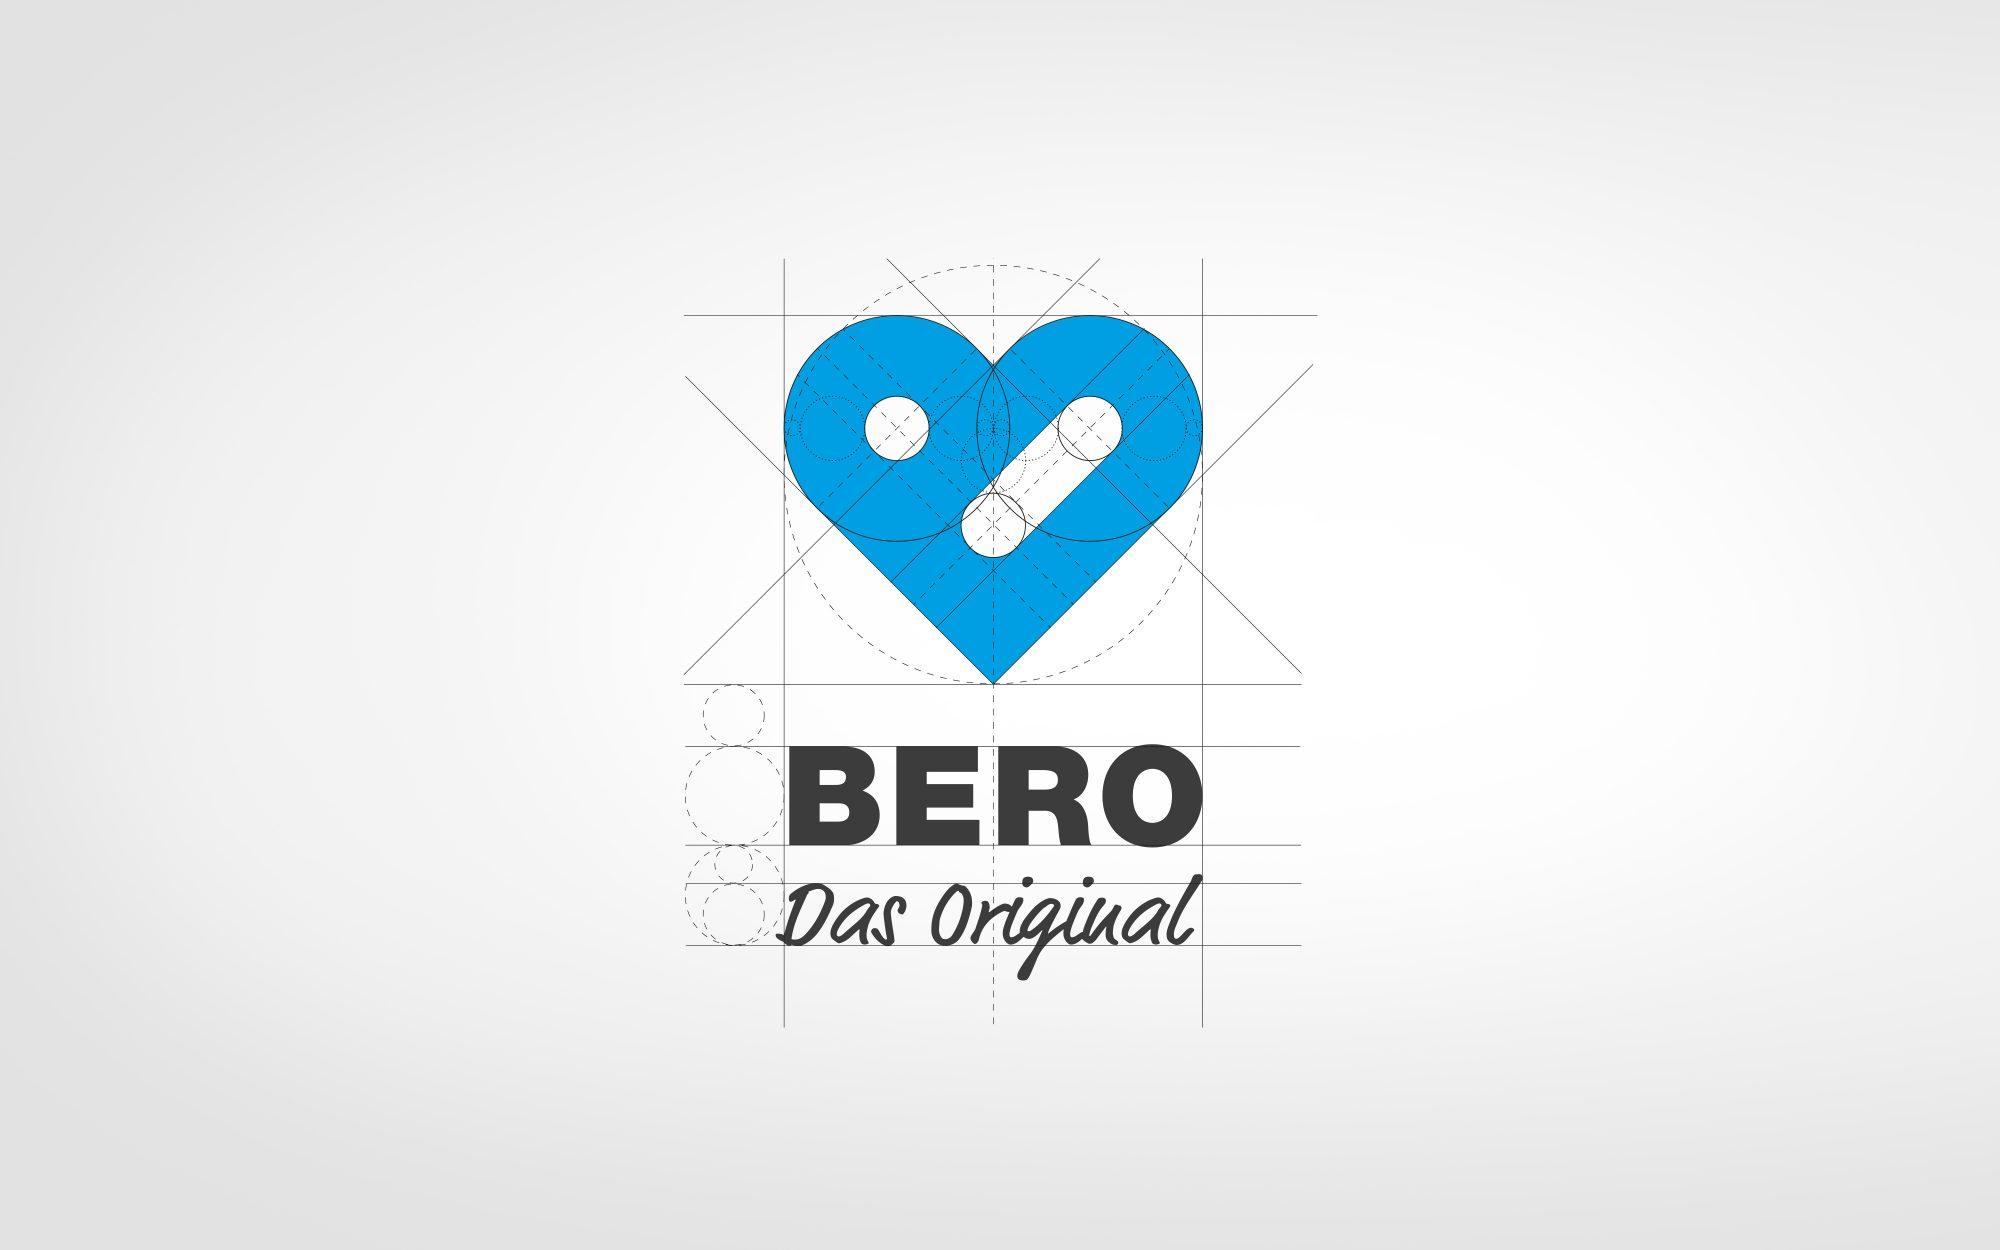 GRACO-Bero-Corporate-Design-Logoentwicklung-2